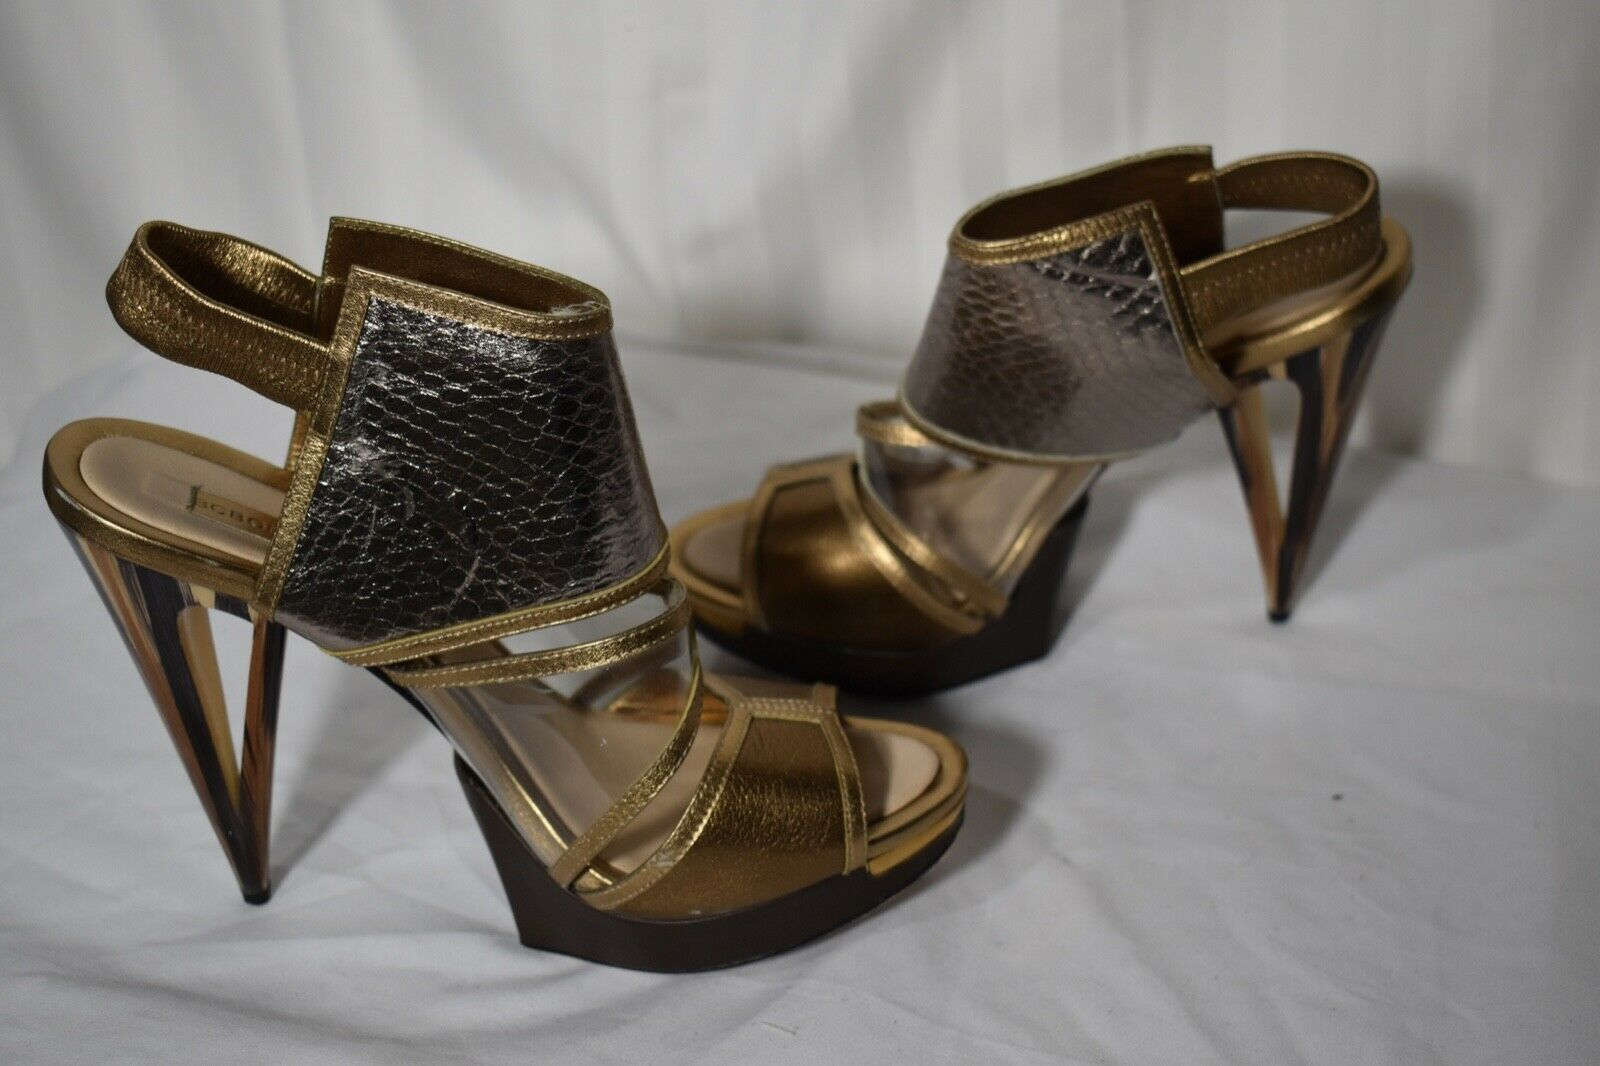 BCBG Maxazria runway gold clear straps high heel sandals size 9i